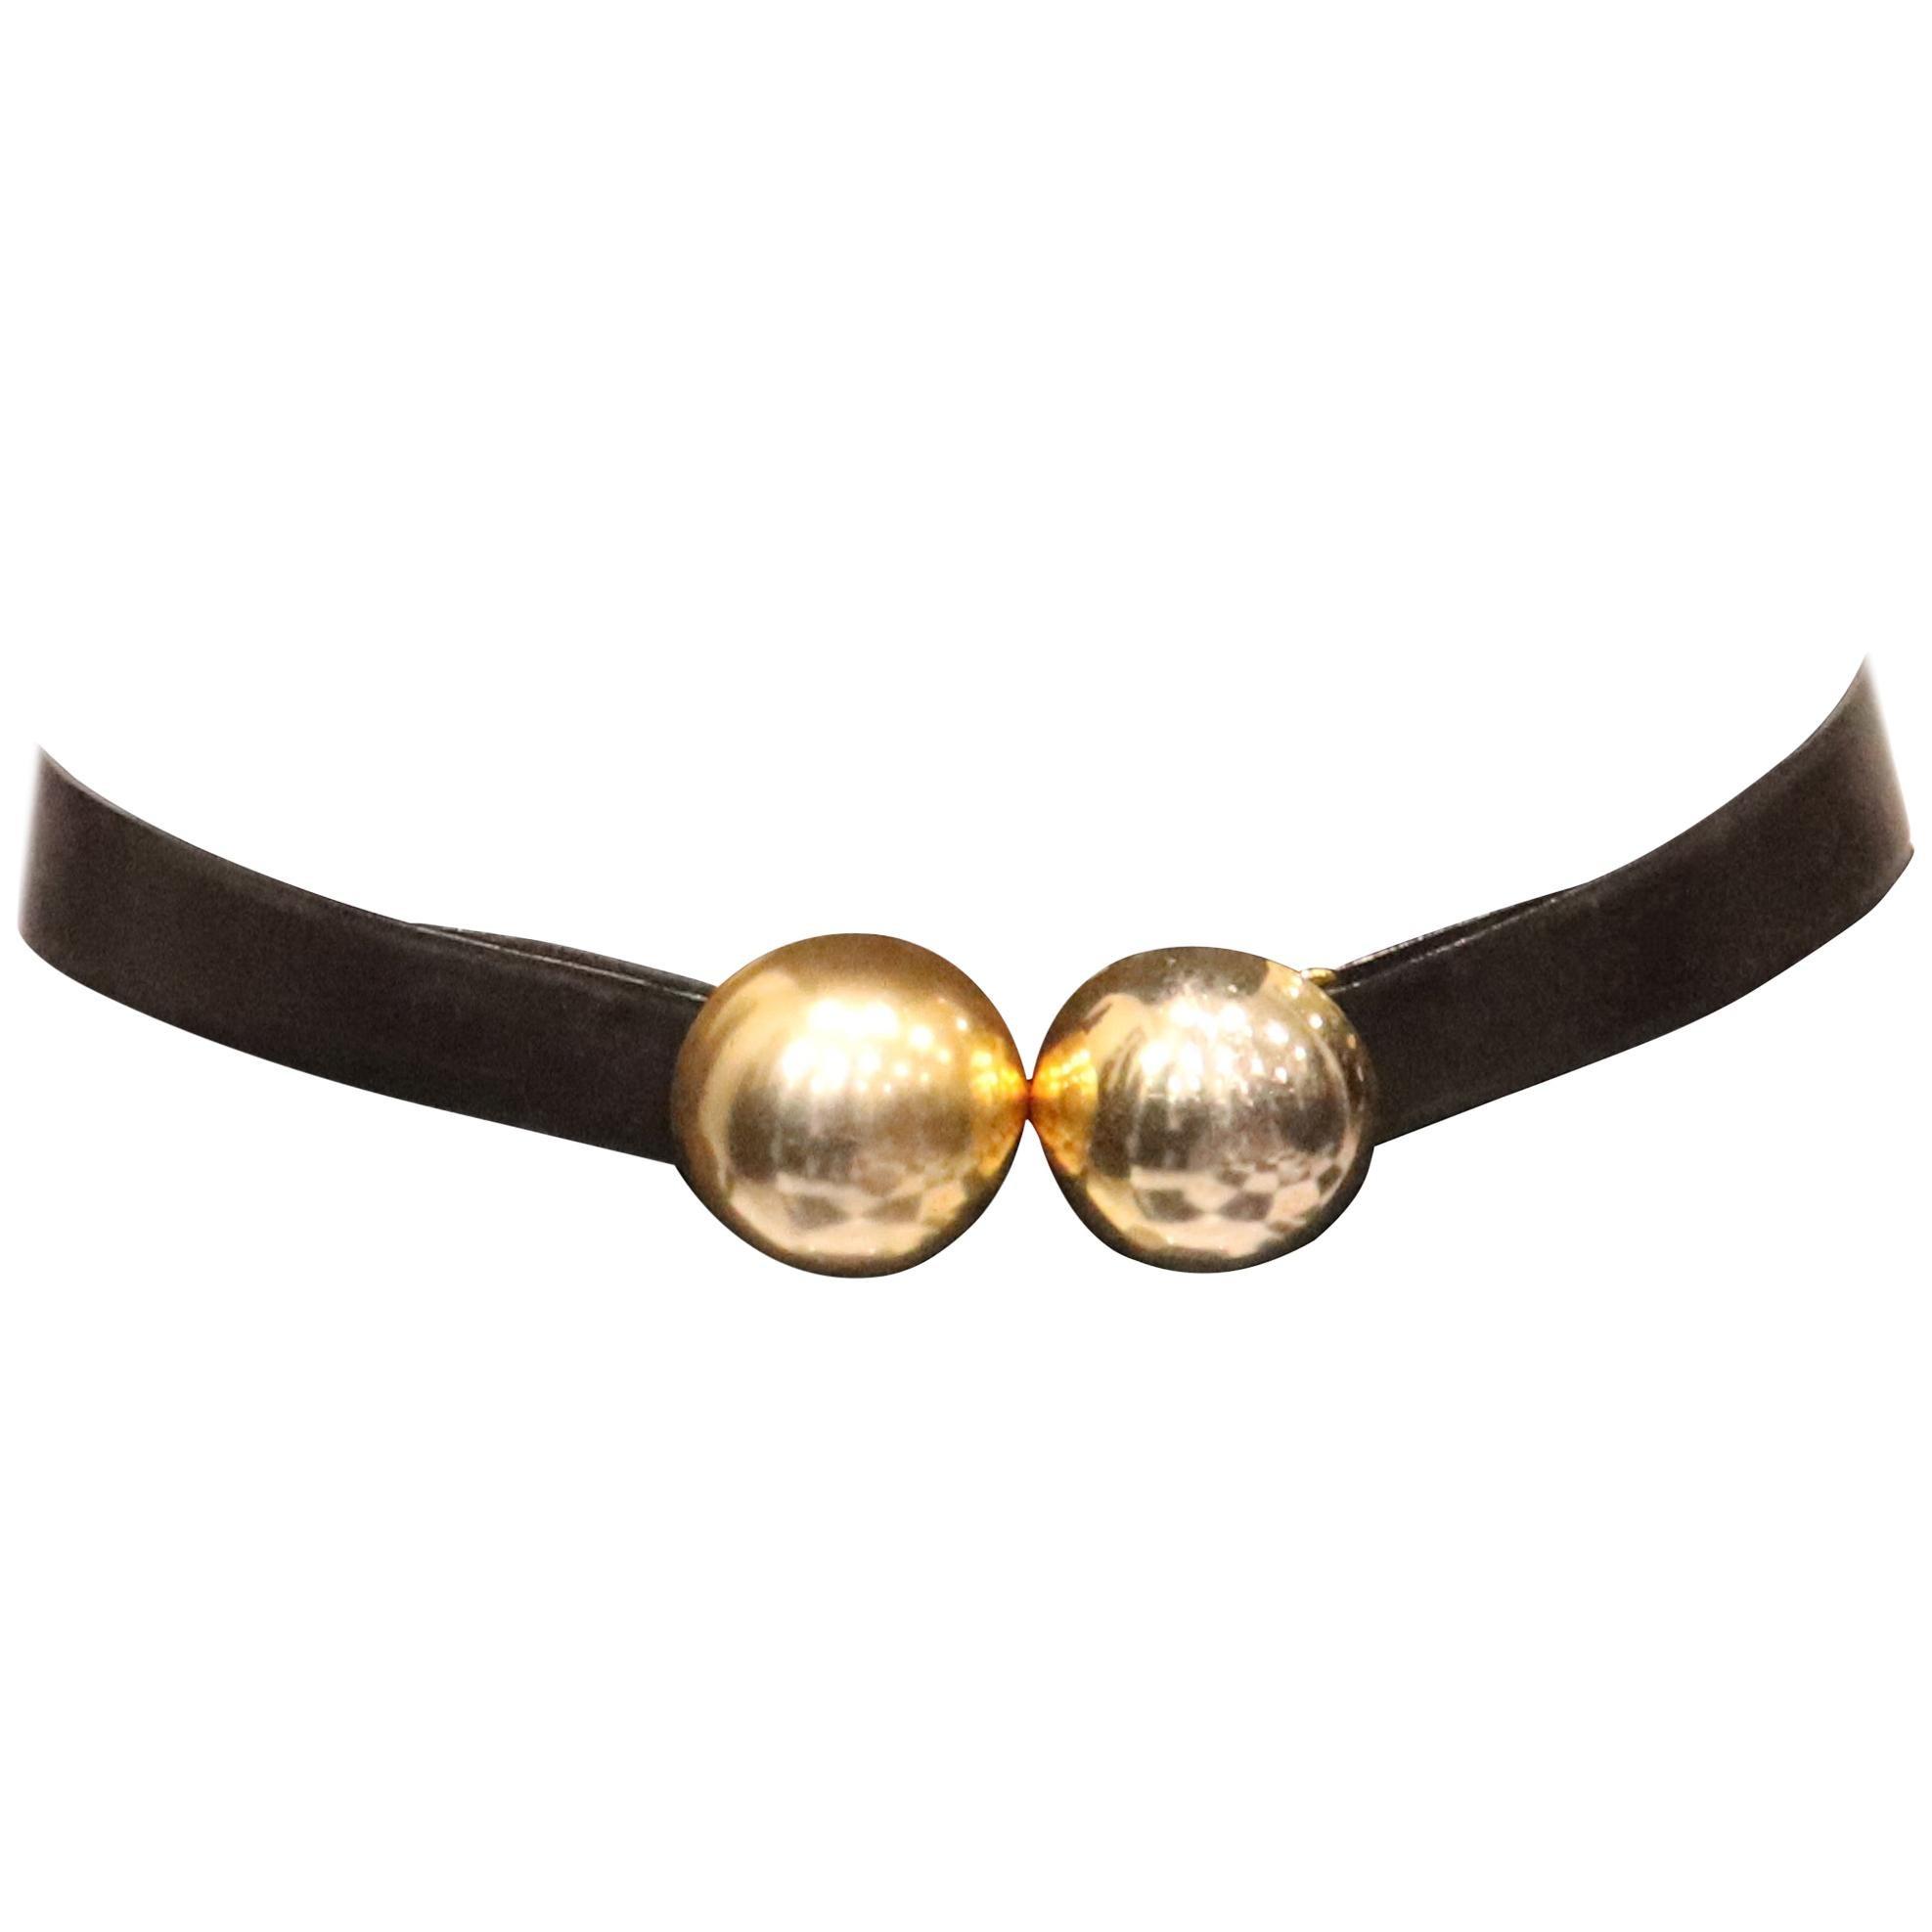 Donna Karan Black Leather Belt W/ 2 Large Gold Balls Closure